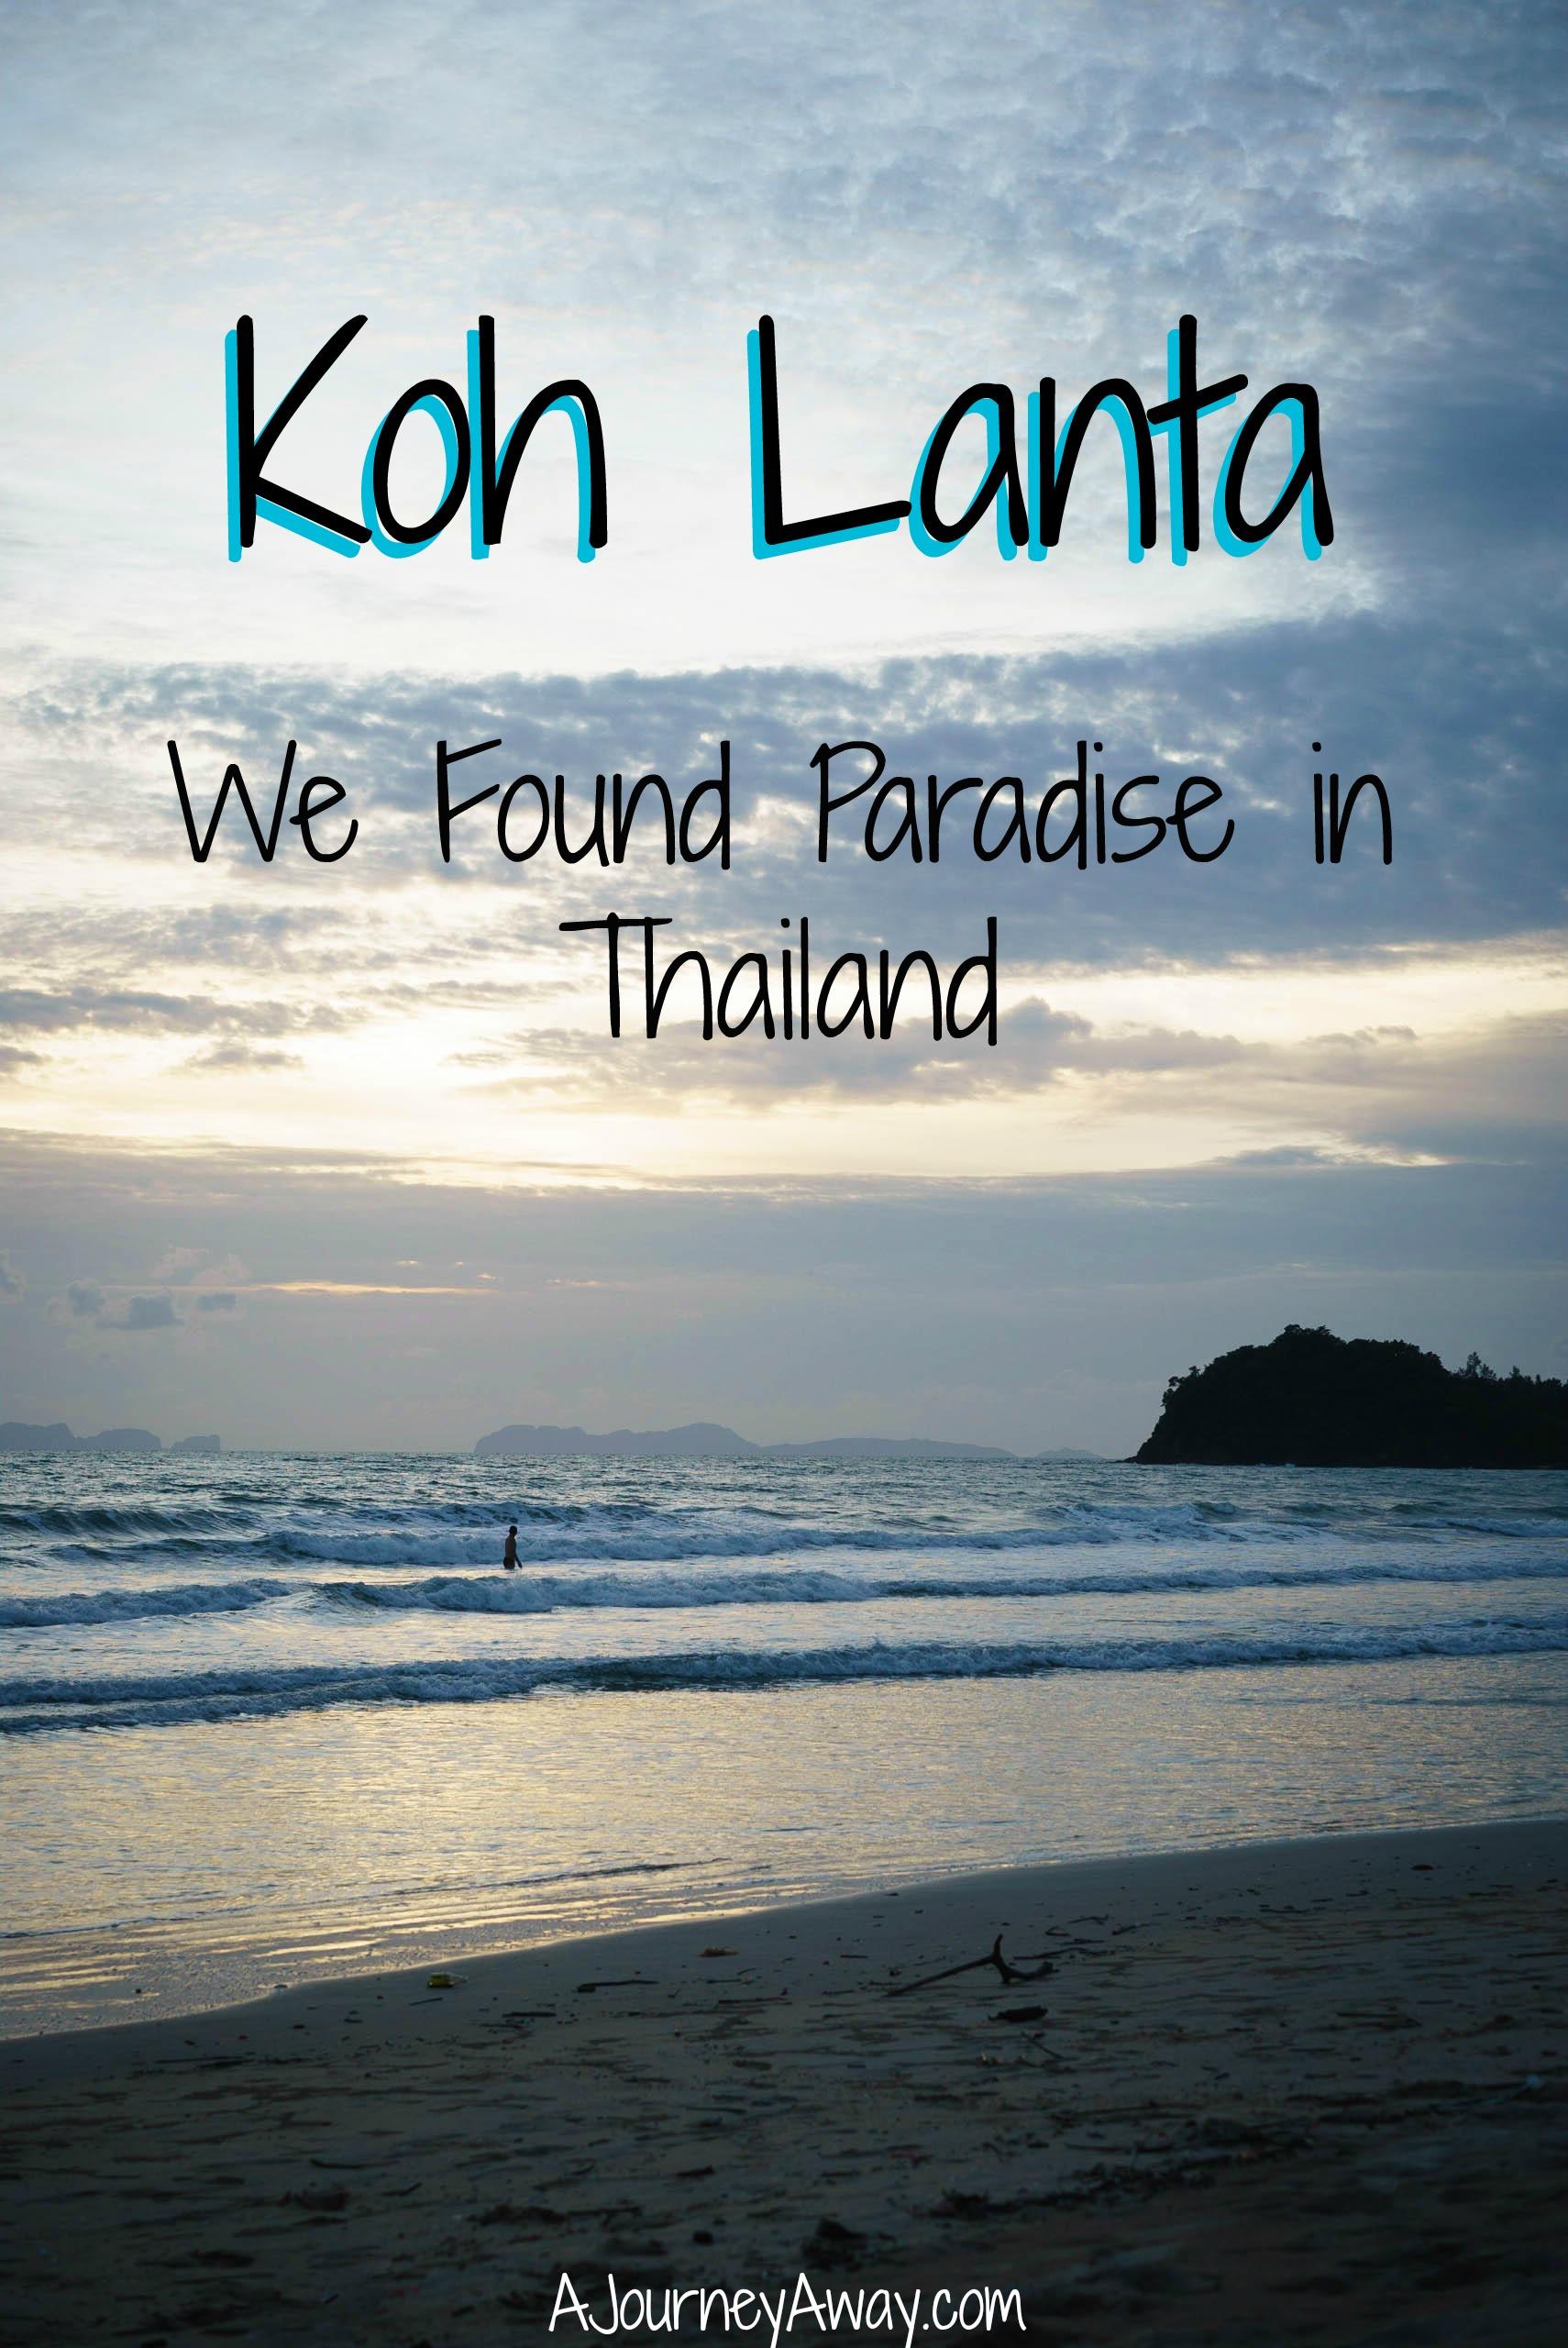 Koh Lanta, Thailand: we found paradise | A Journey Away travel blog